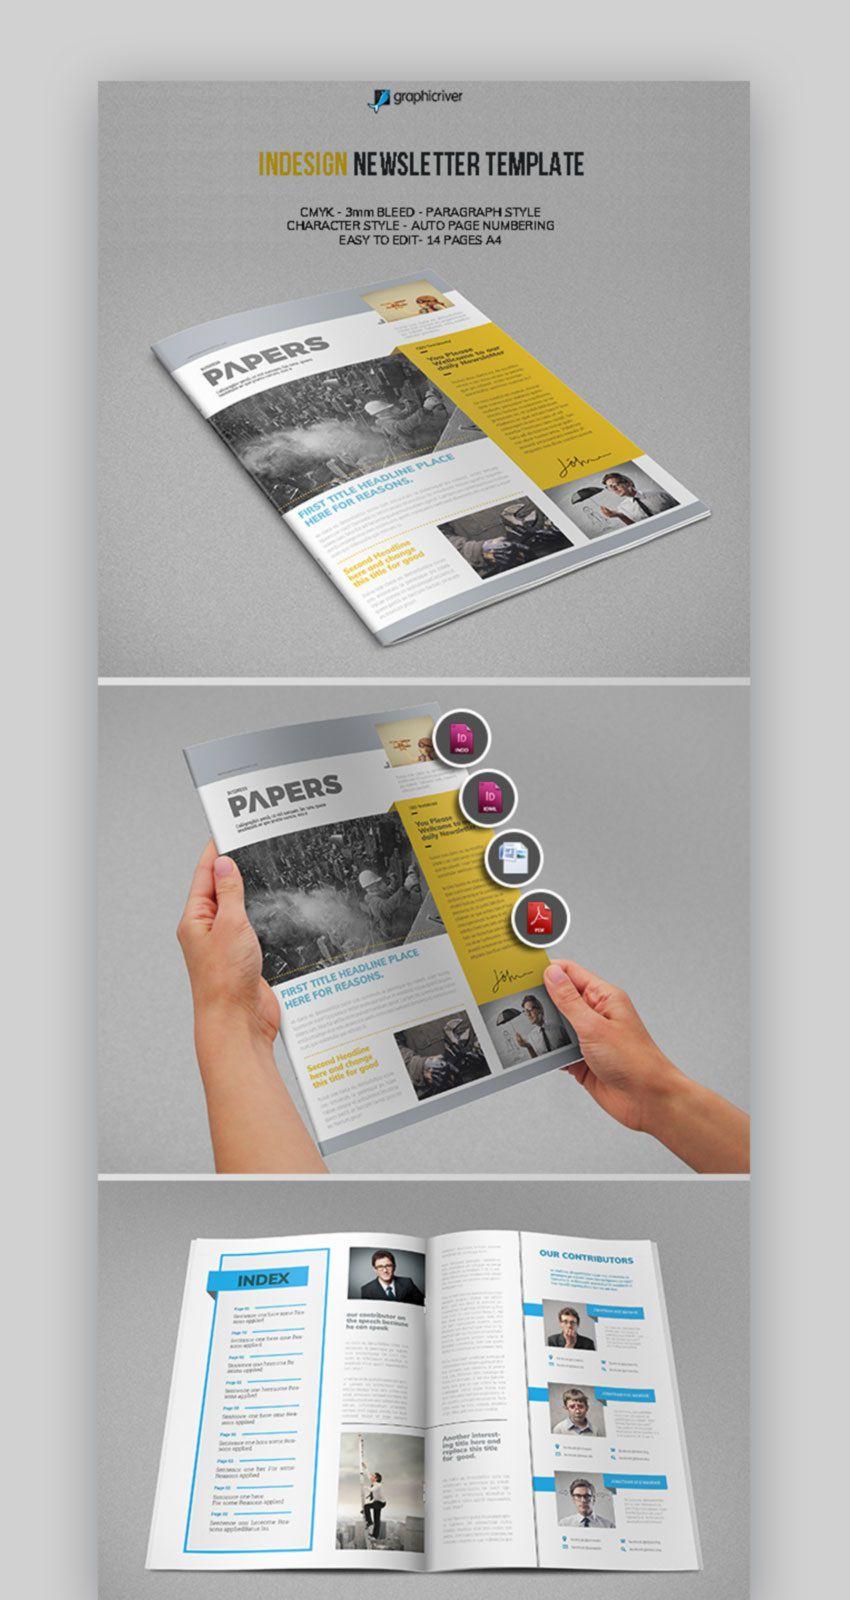 004 Phenomenal Publisher Newsletter Template Free Image  Microsoft Office DownloadFull